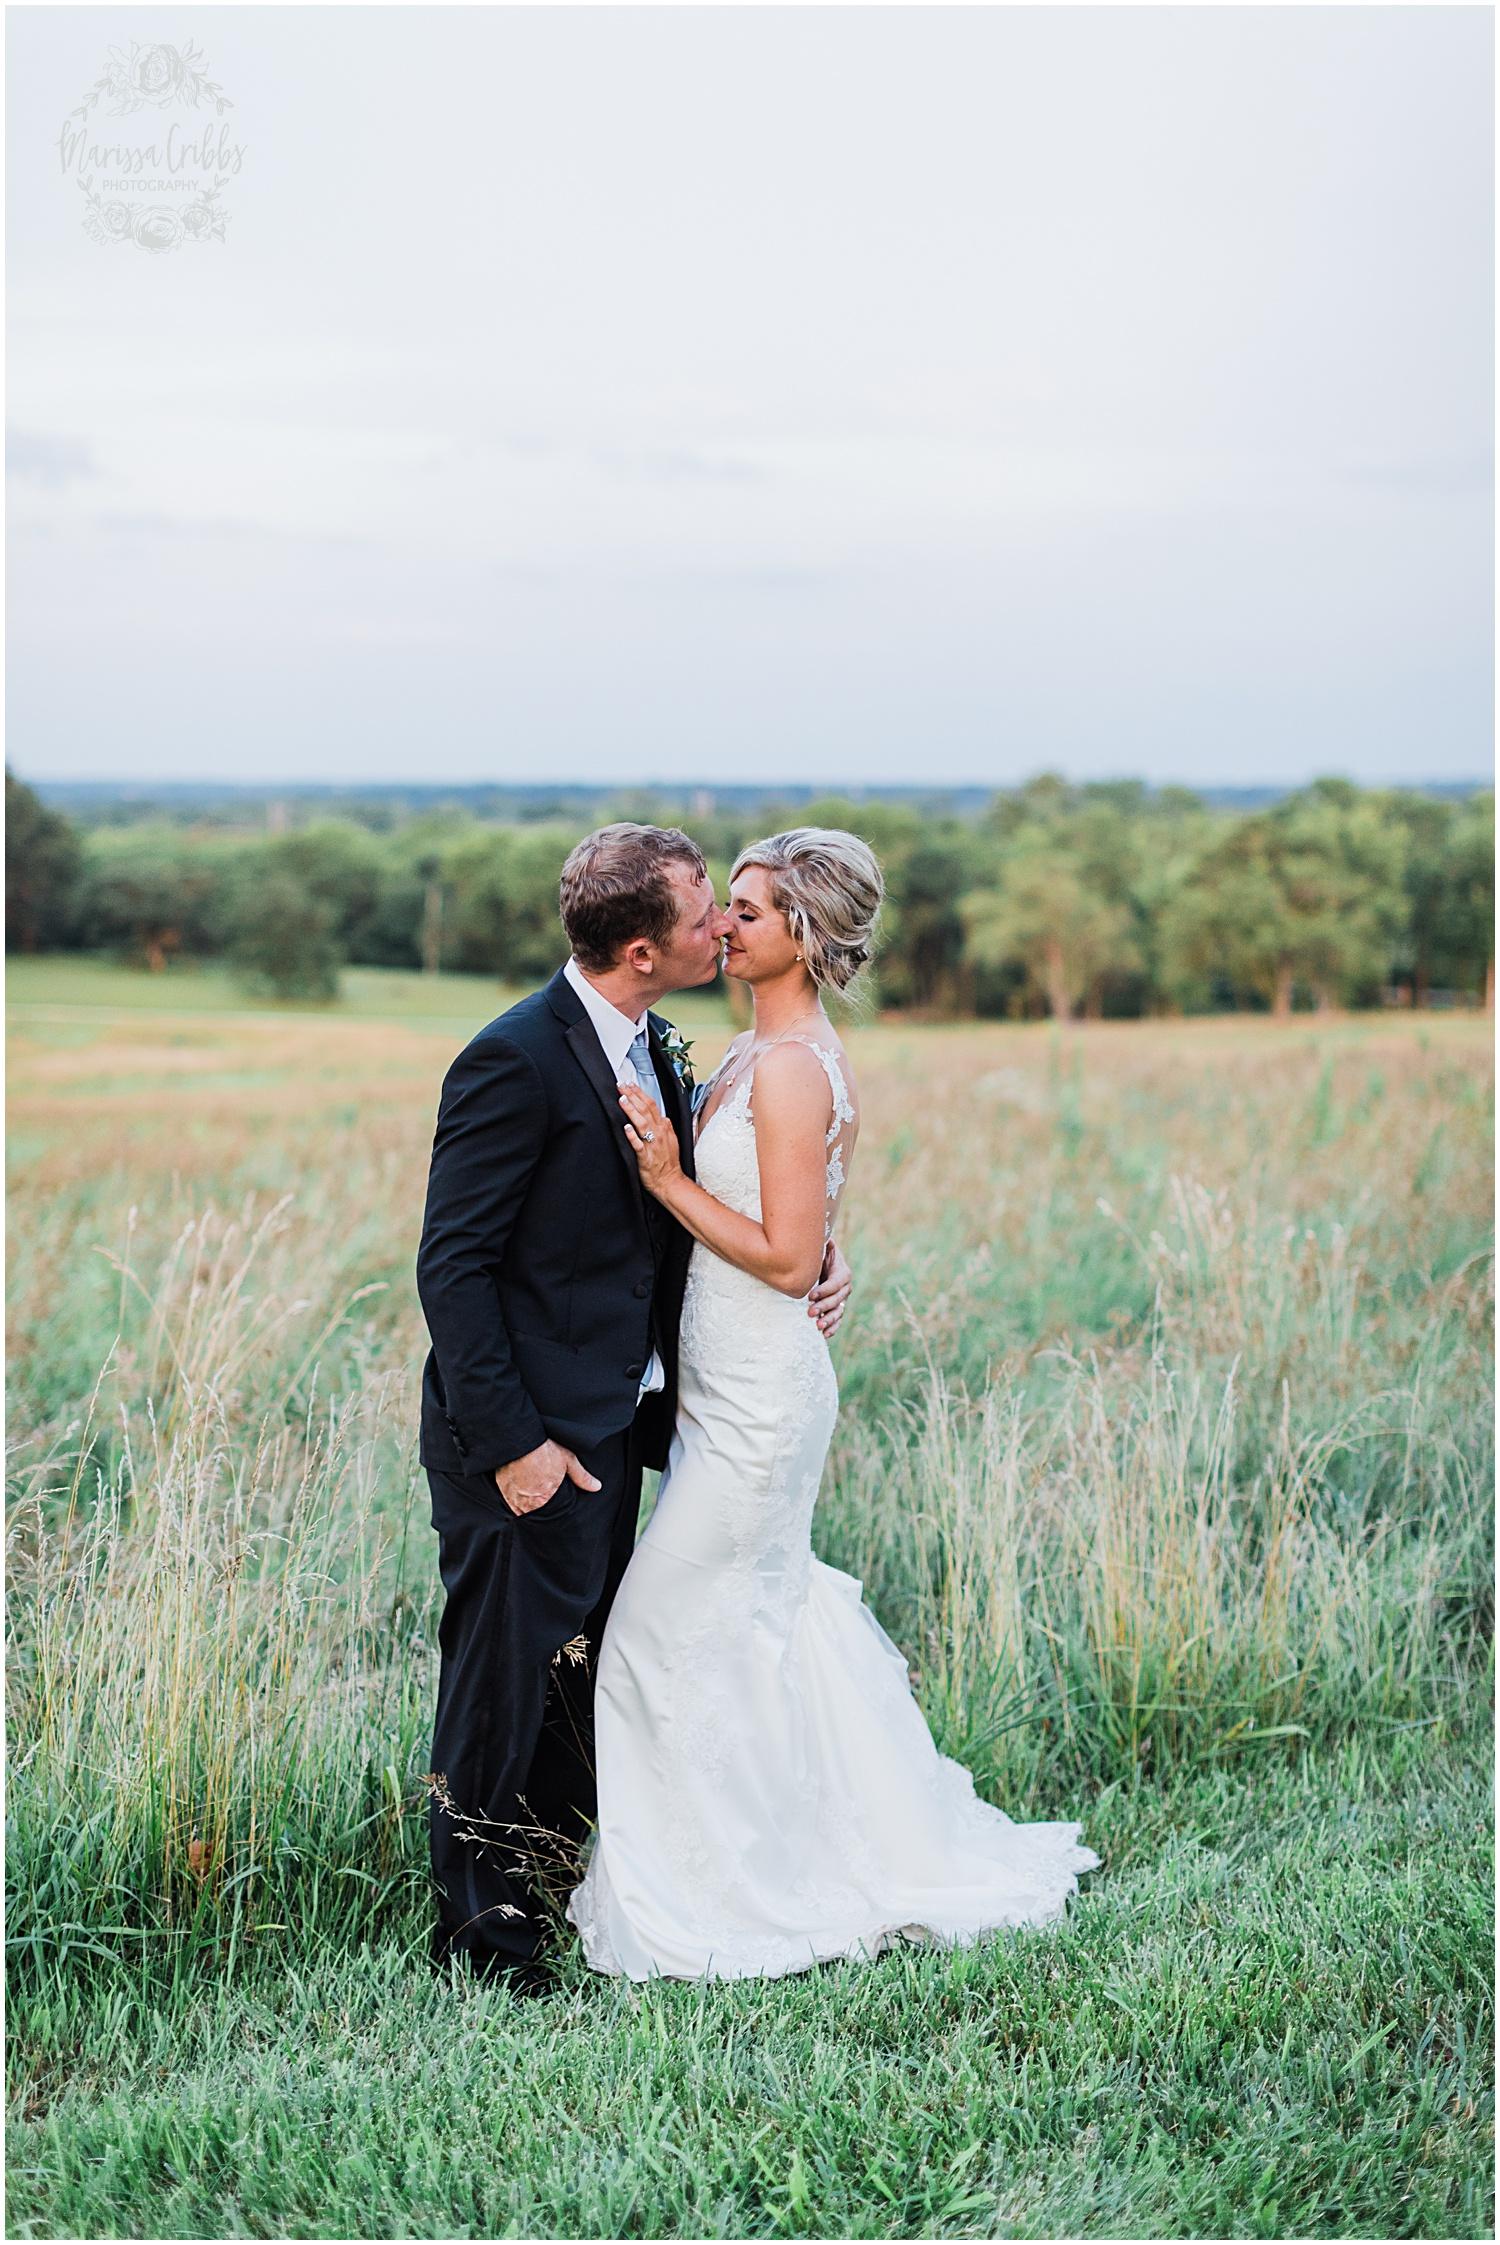 CHELSEA & BEN MARRIED BLOG  | MARISSA CRIBBS PHOTOGRAPHY_8643.jpg